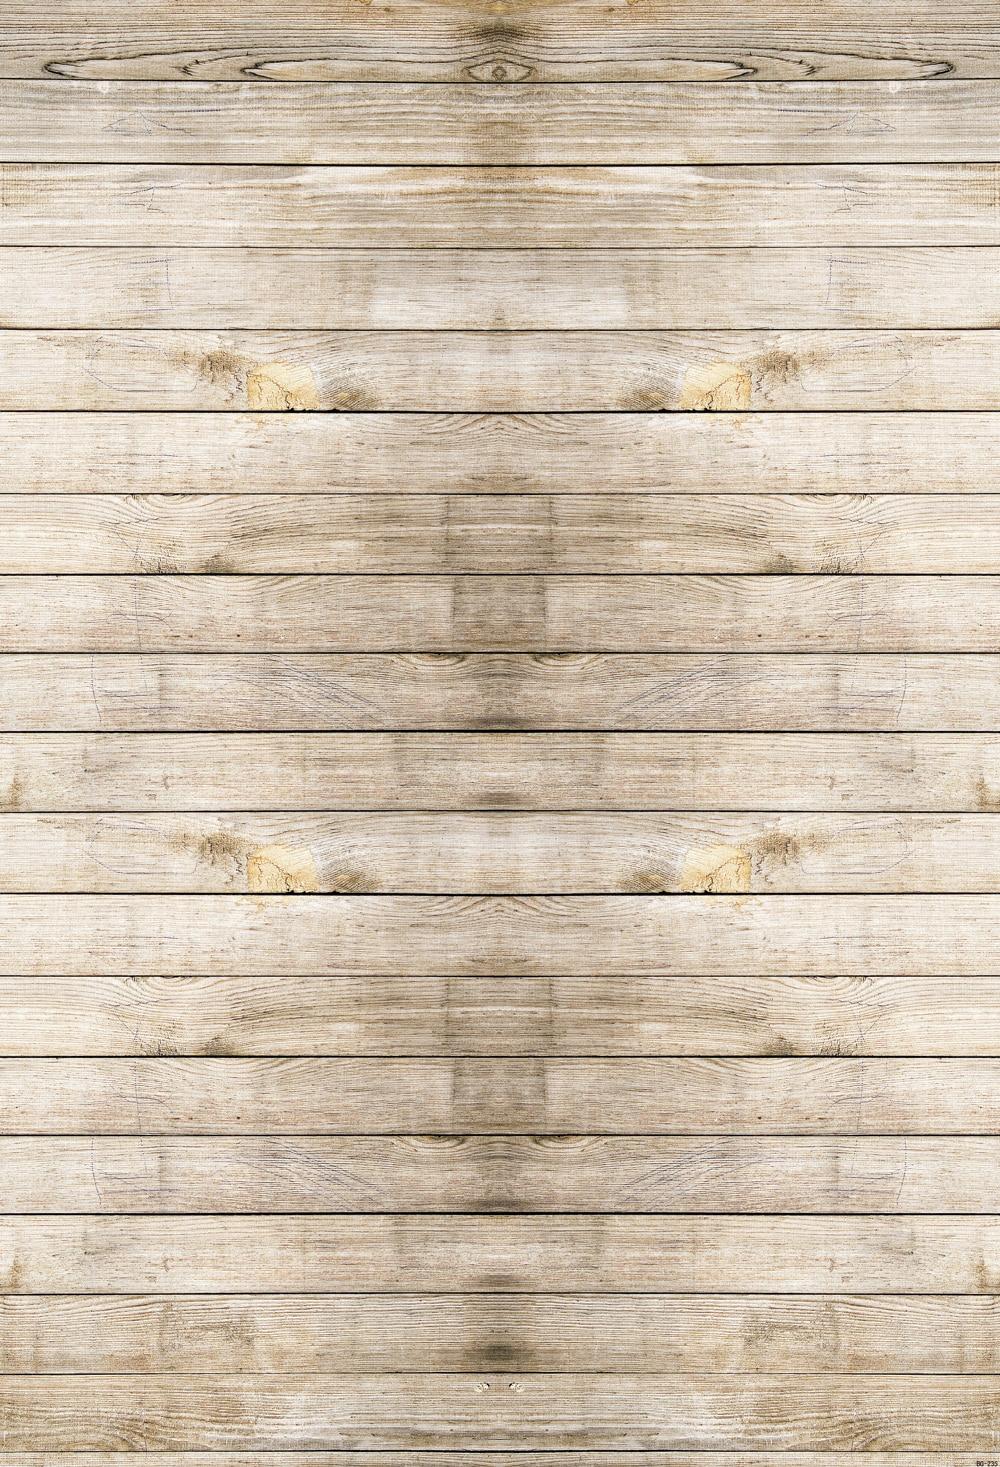 Hua Art Fabric Photography Backdrop Vintage Wood Floor